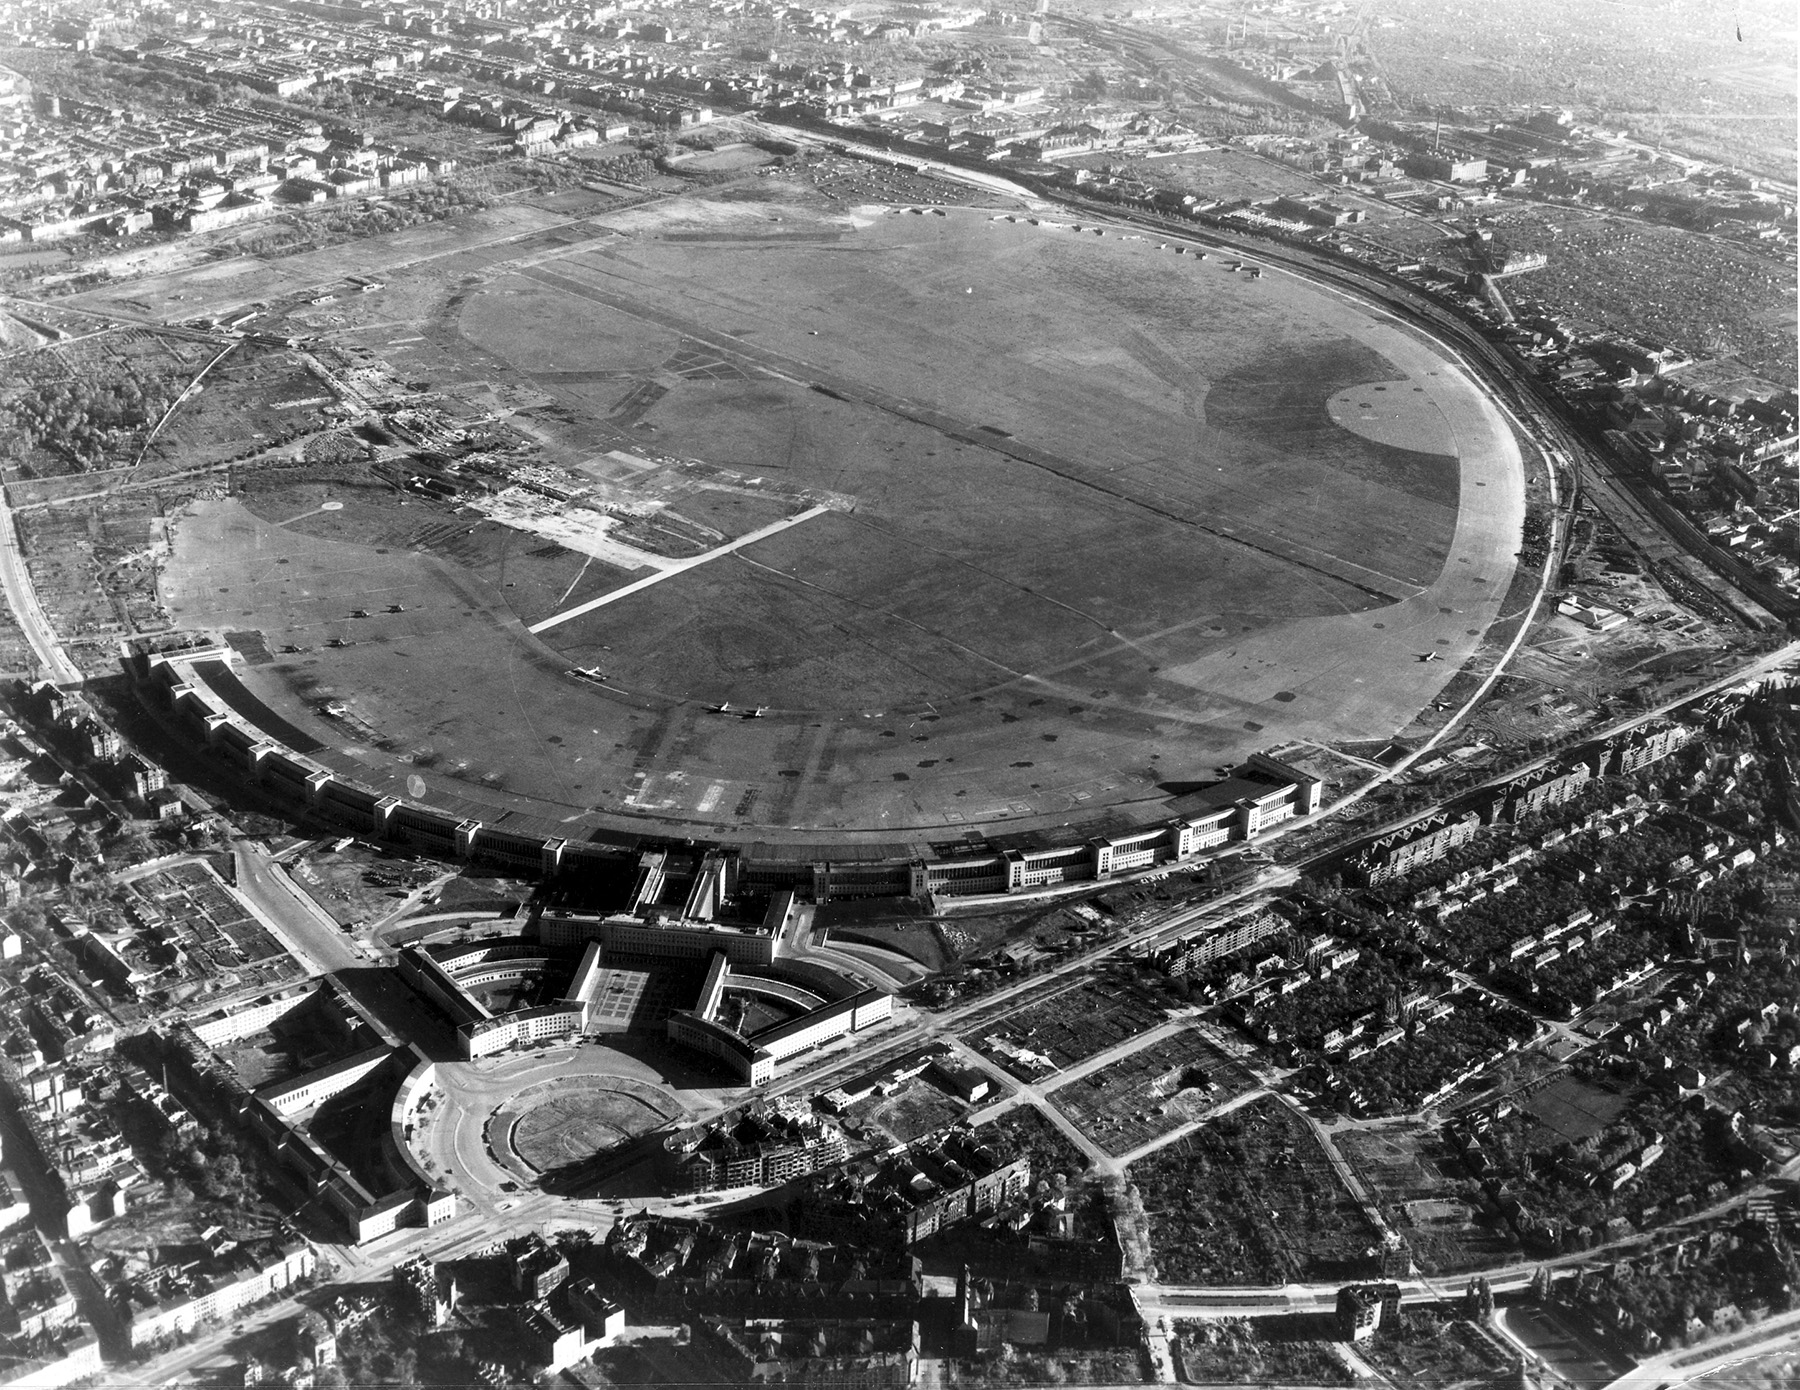 Berlin Tempelhof Airport from above